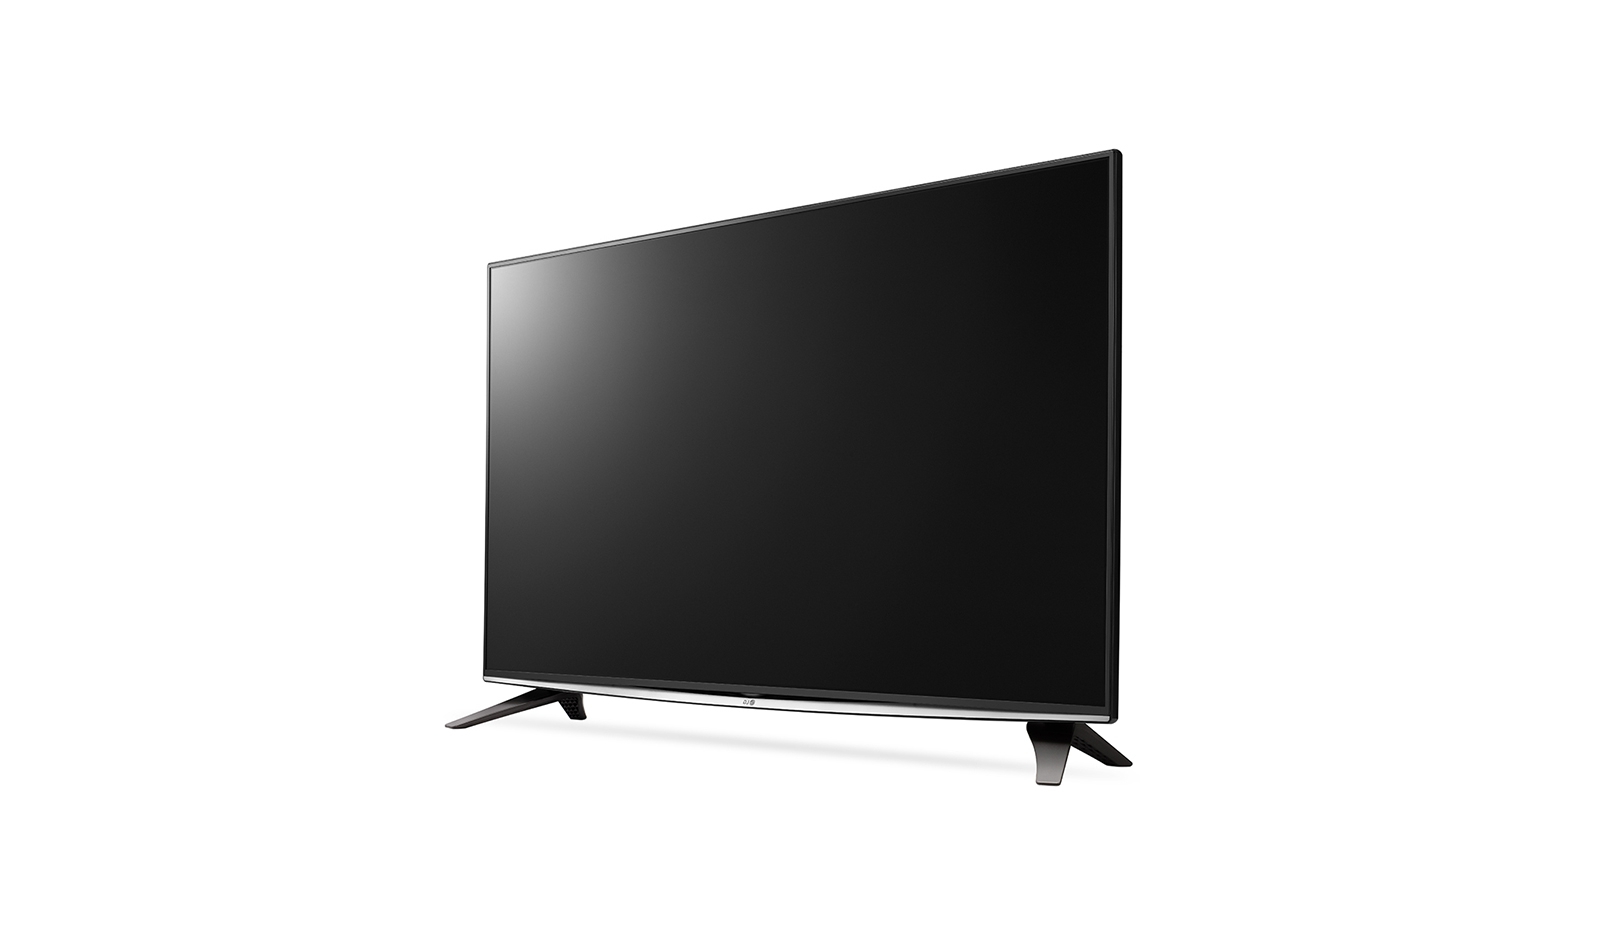 50Uh635V 4K Ultra Hd Tv | Lg Electronics Türkiye Inside Preston 66 Inch Tv Stands (Gallery 15 of 20)